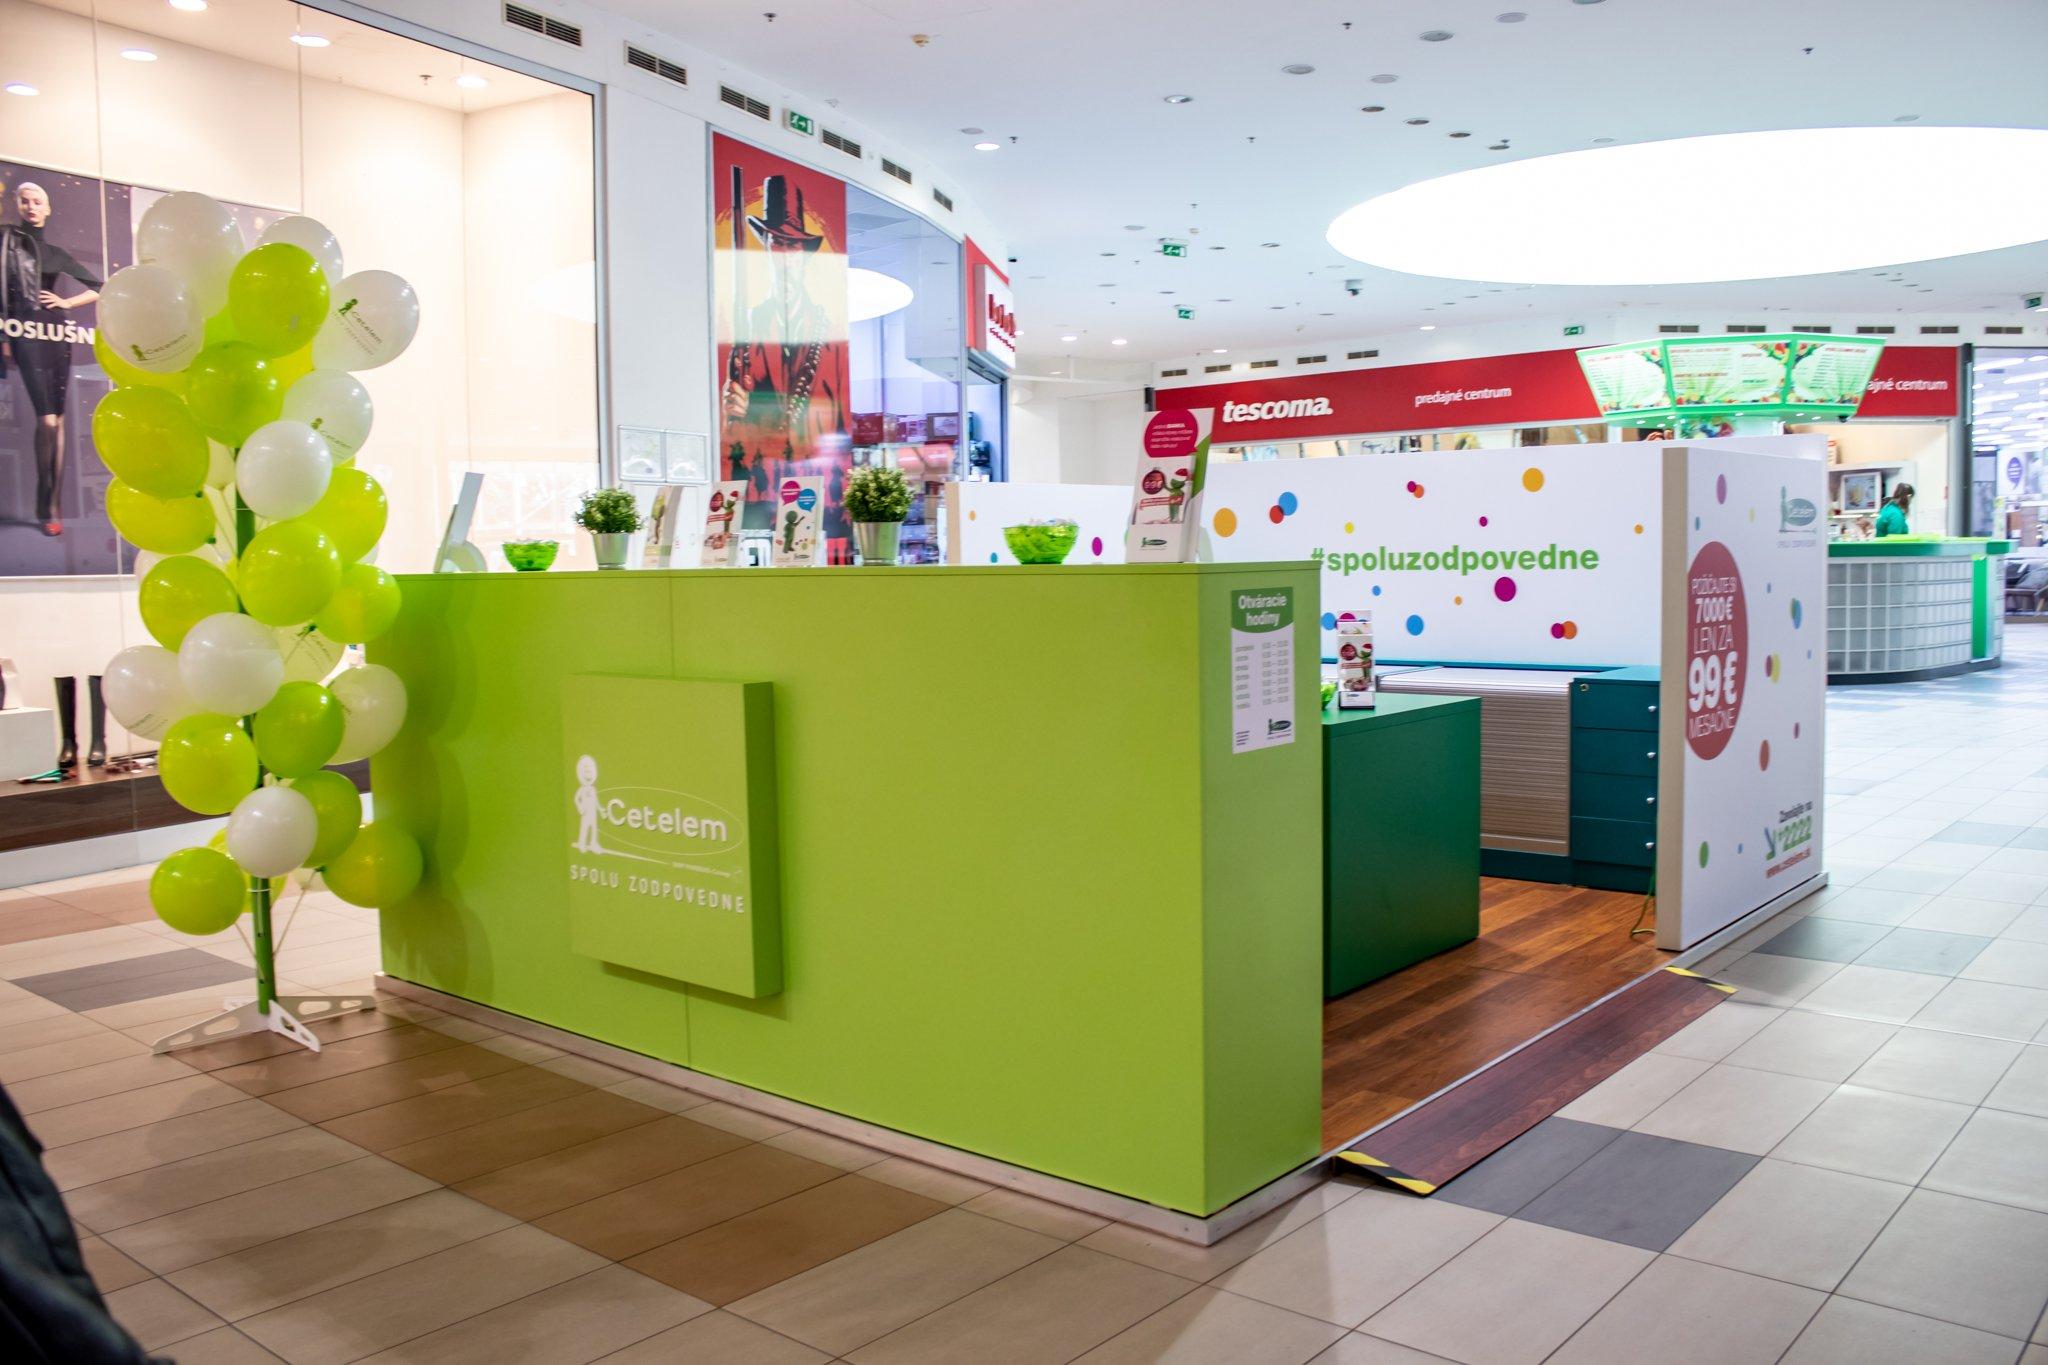 badba2f1f5 Mobilná pobočka v Europa Shopping Centrum Banská Bystrica